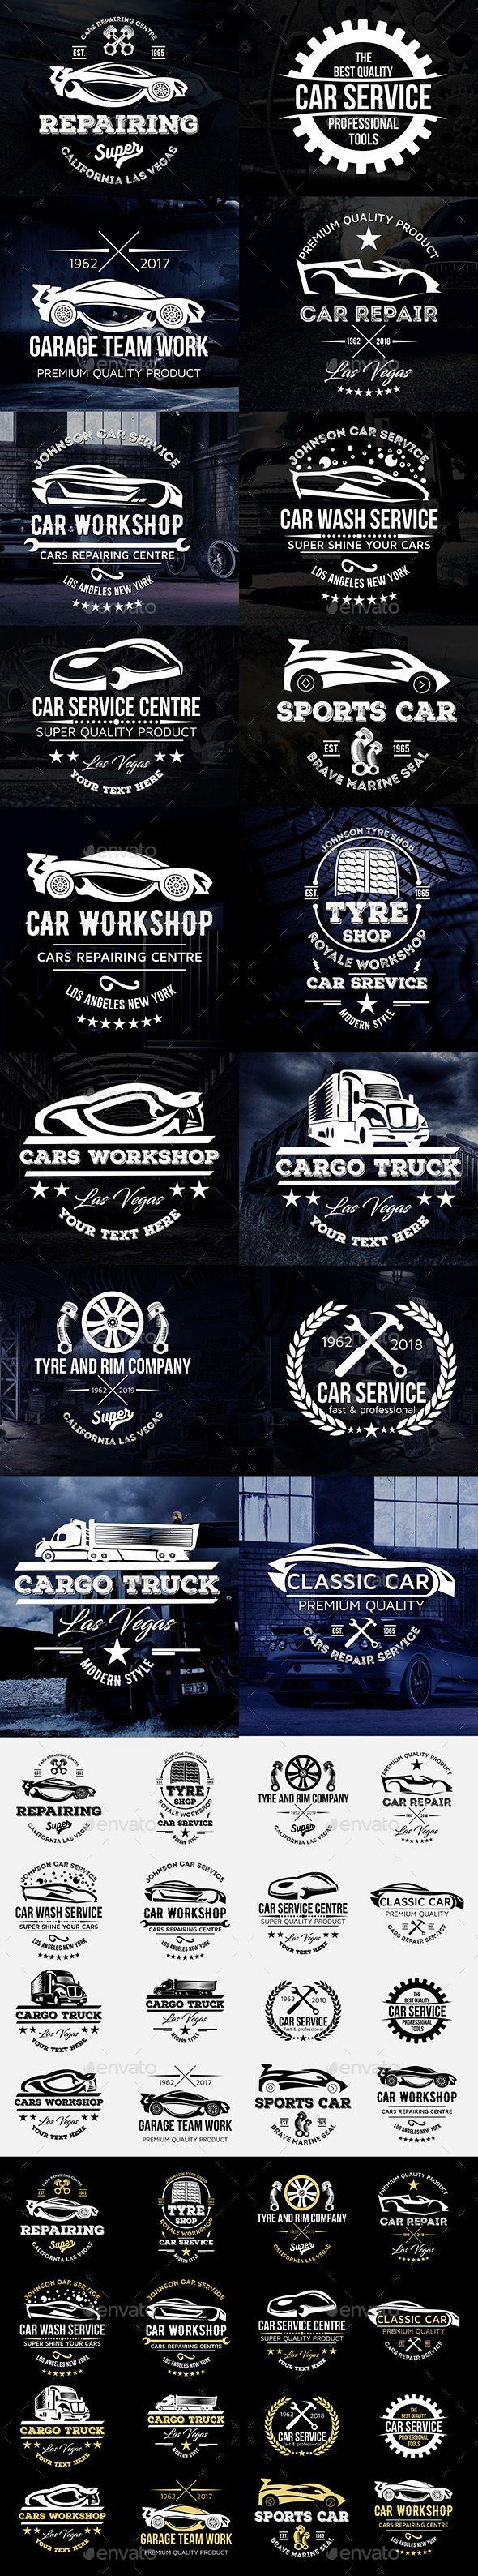 Car body sticker design eps - Cars Logos Badges Set